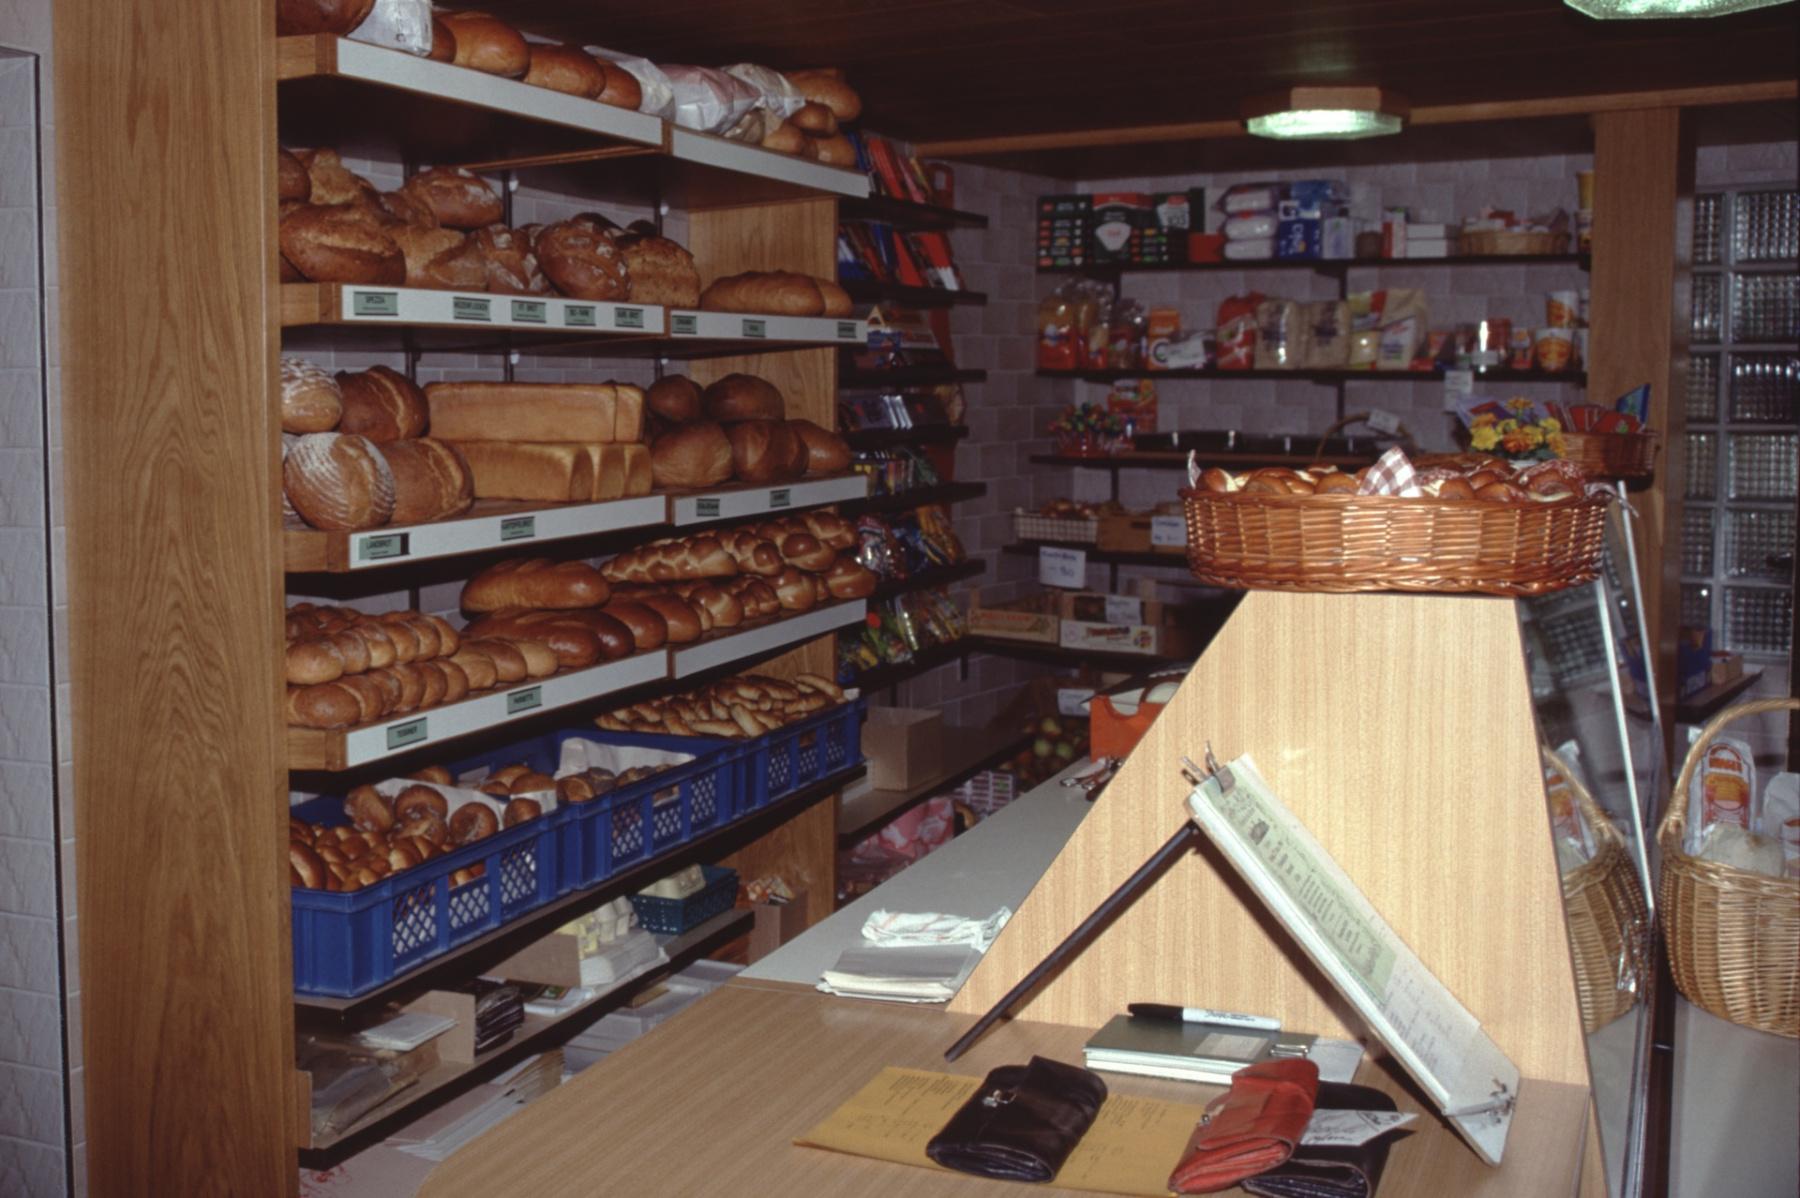 Bäckerei Meier, Laden umgebaut